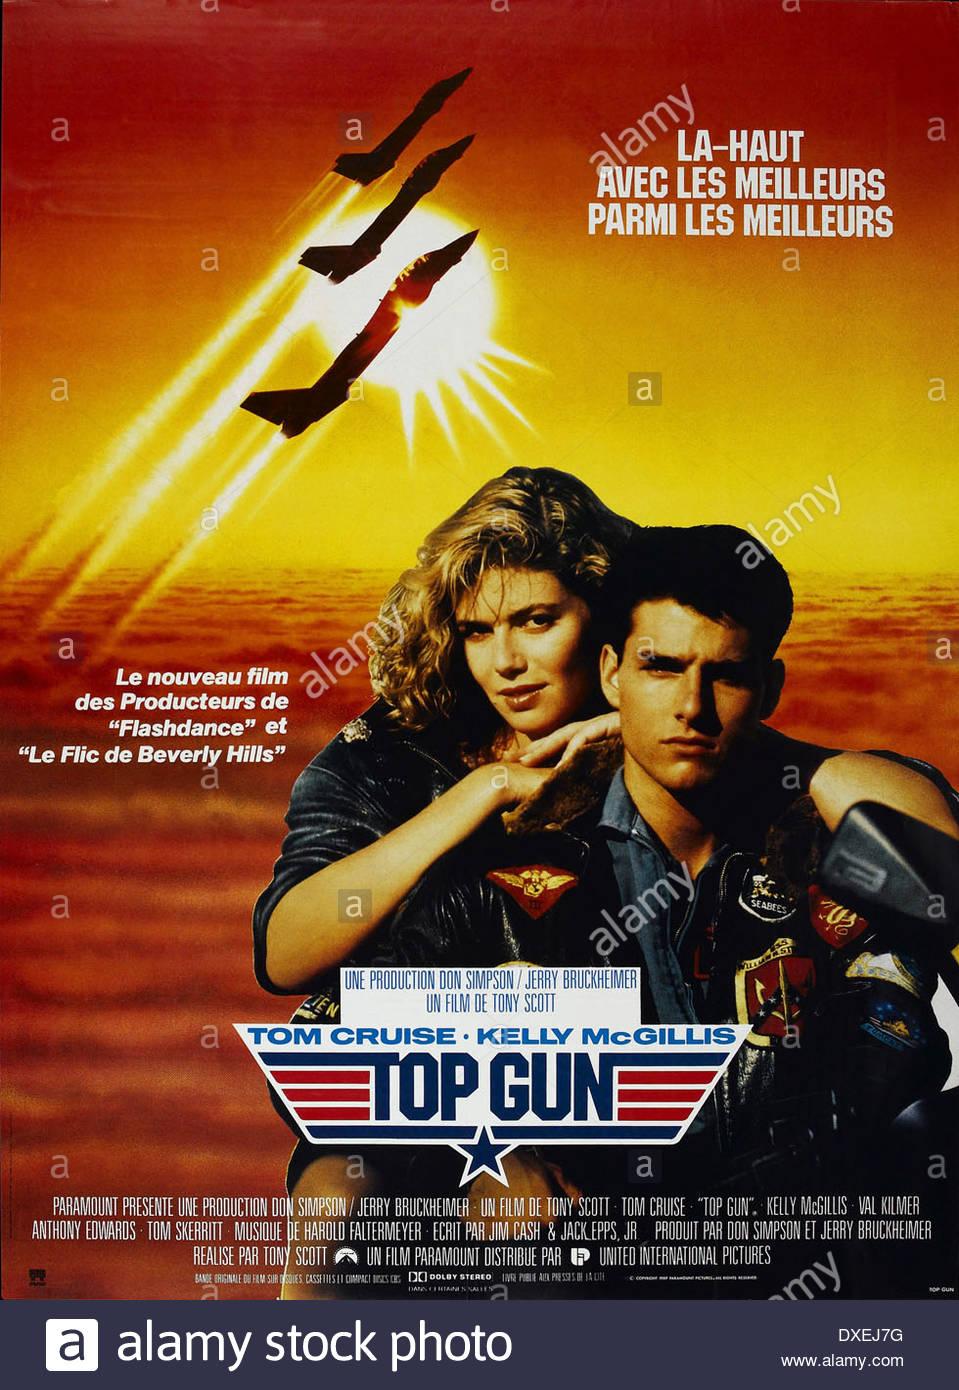 Top Gun  Year : 1986 USA Director : Tony Scott Kelly McGillis, Tom Cruise Movie poster (FR) - Stock Image